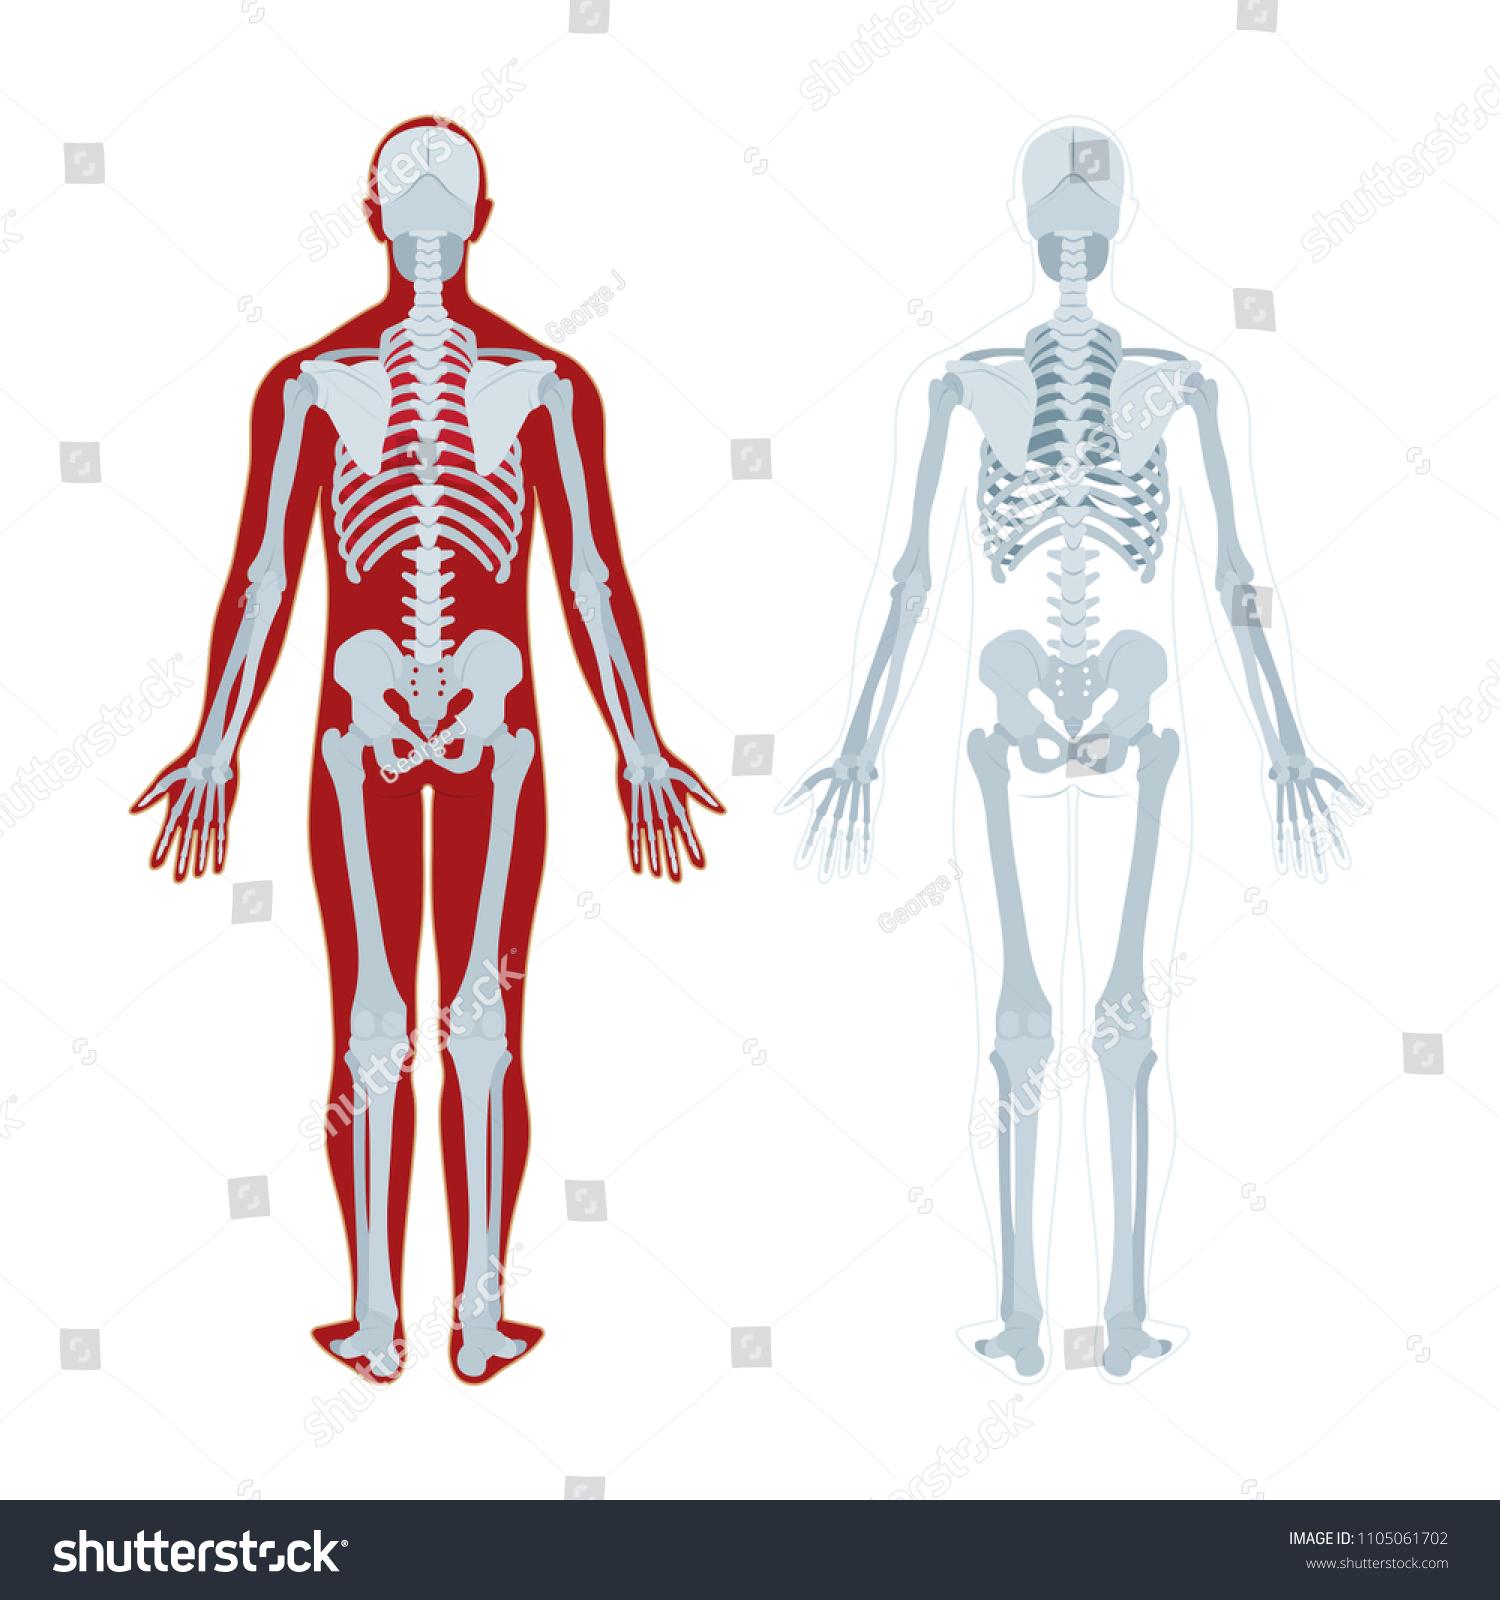 Human Skeleton Human Body Anatomy Skeleton Stock Vector (Royalty ...